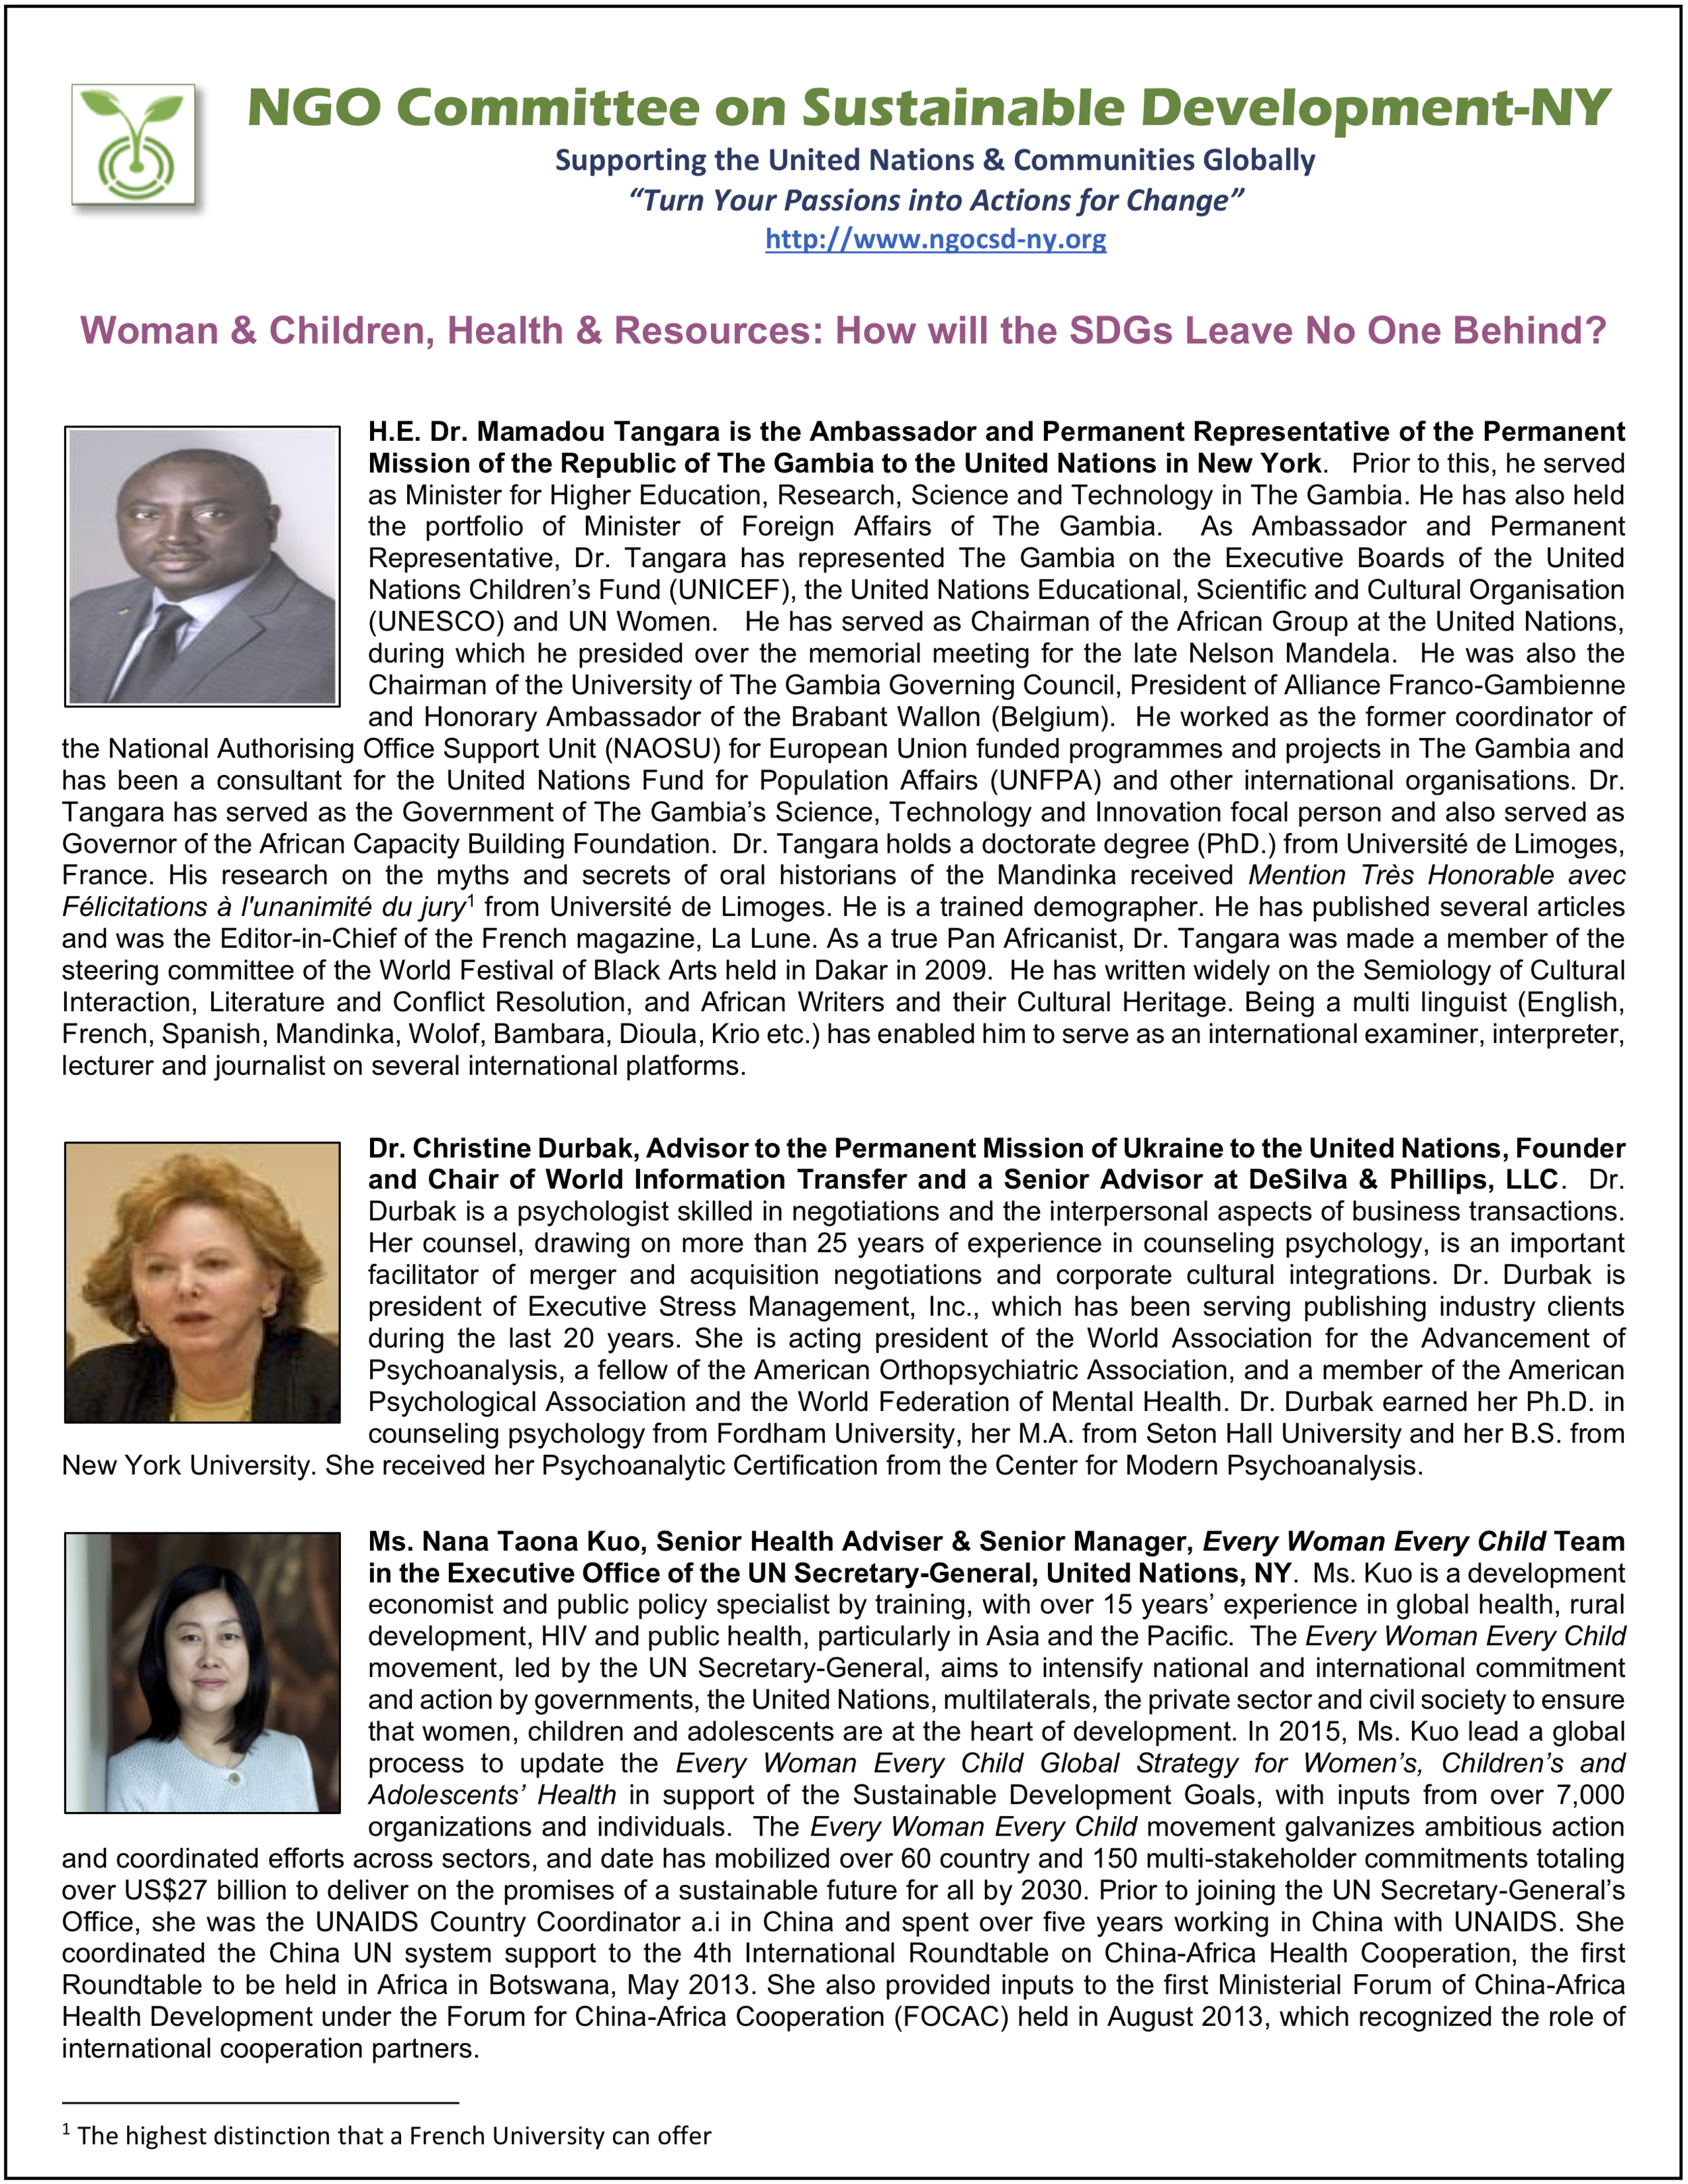 NGOCSD-NY+4-30-18+Women+&+Child+SDGs-Photos+&+Bios+A2.png